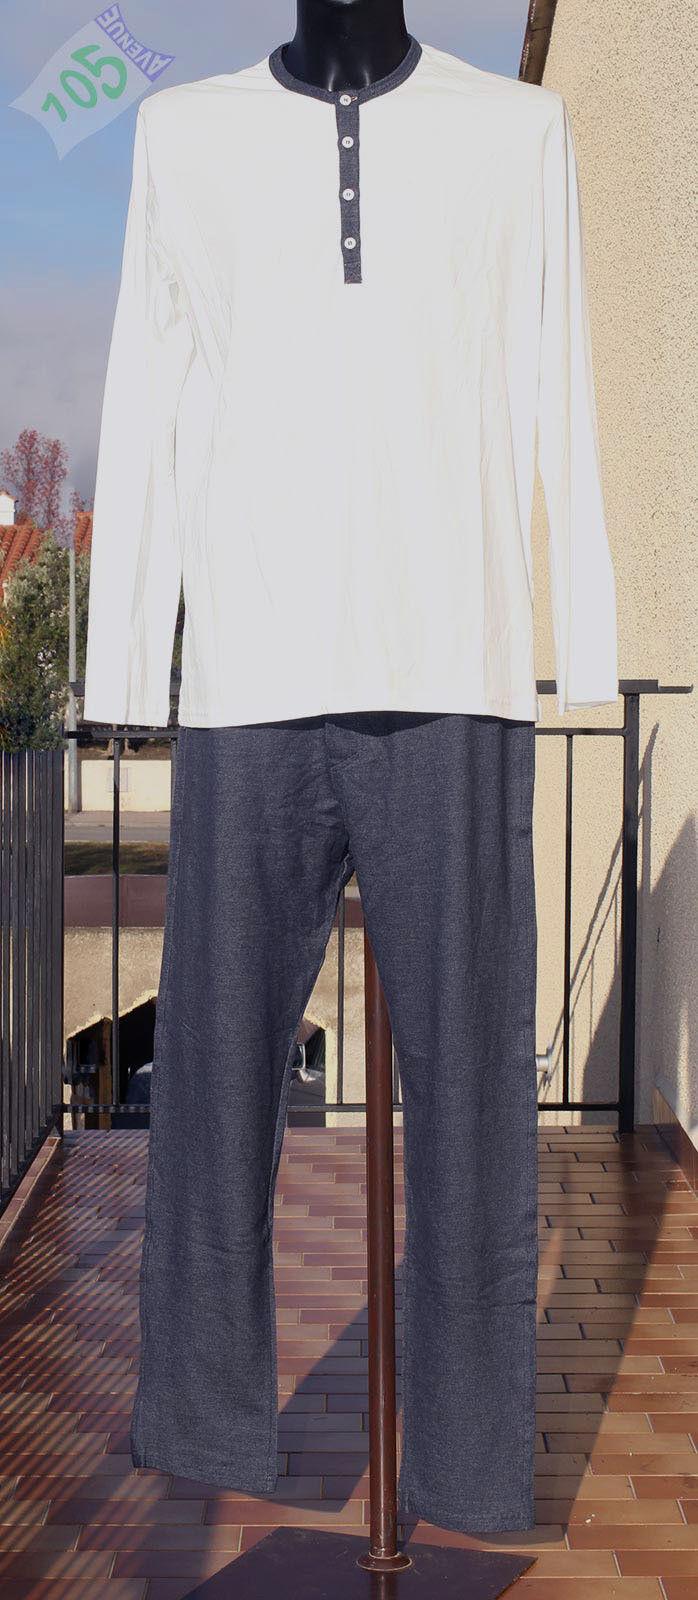 NEUF @@  PYJAMA M.L 100% COTON+ HOM Loungewear Jay + FR 3 5 ou 6 (4 6 ou 7 eur)